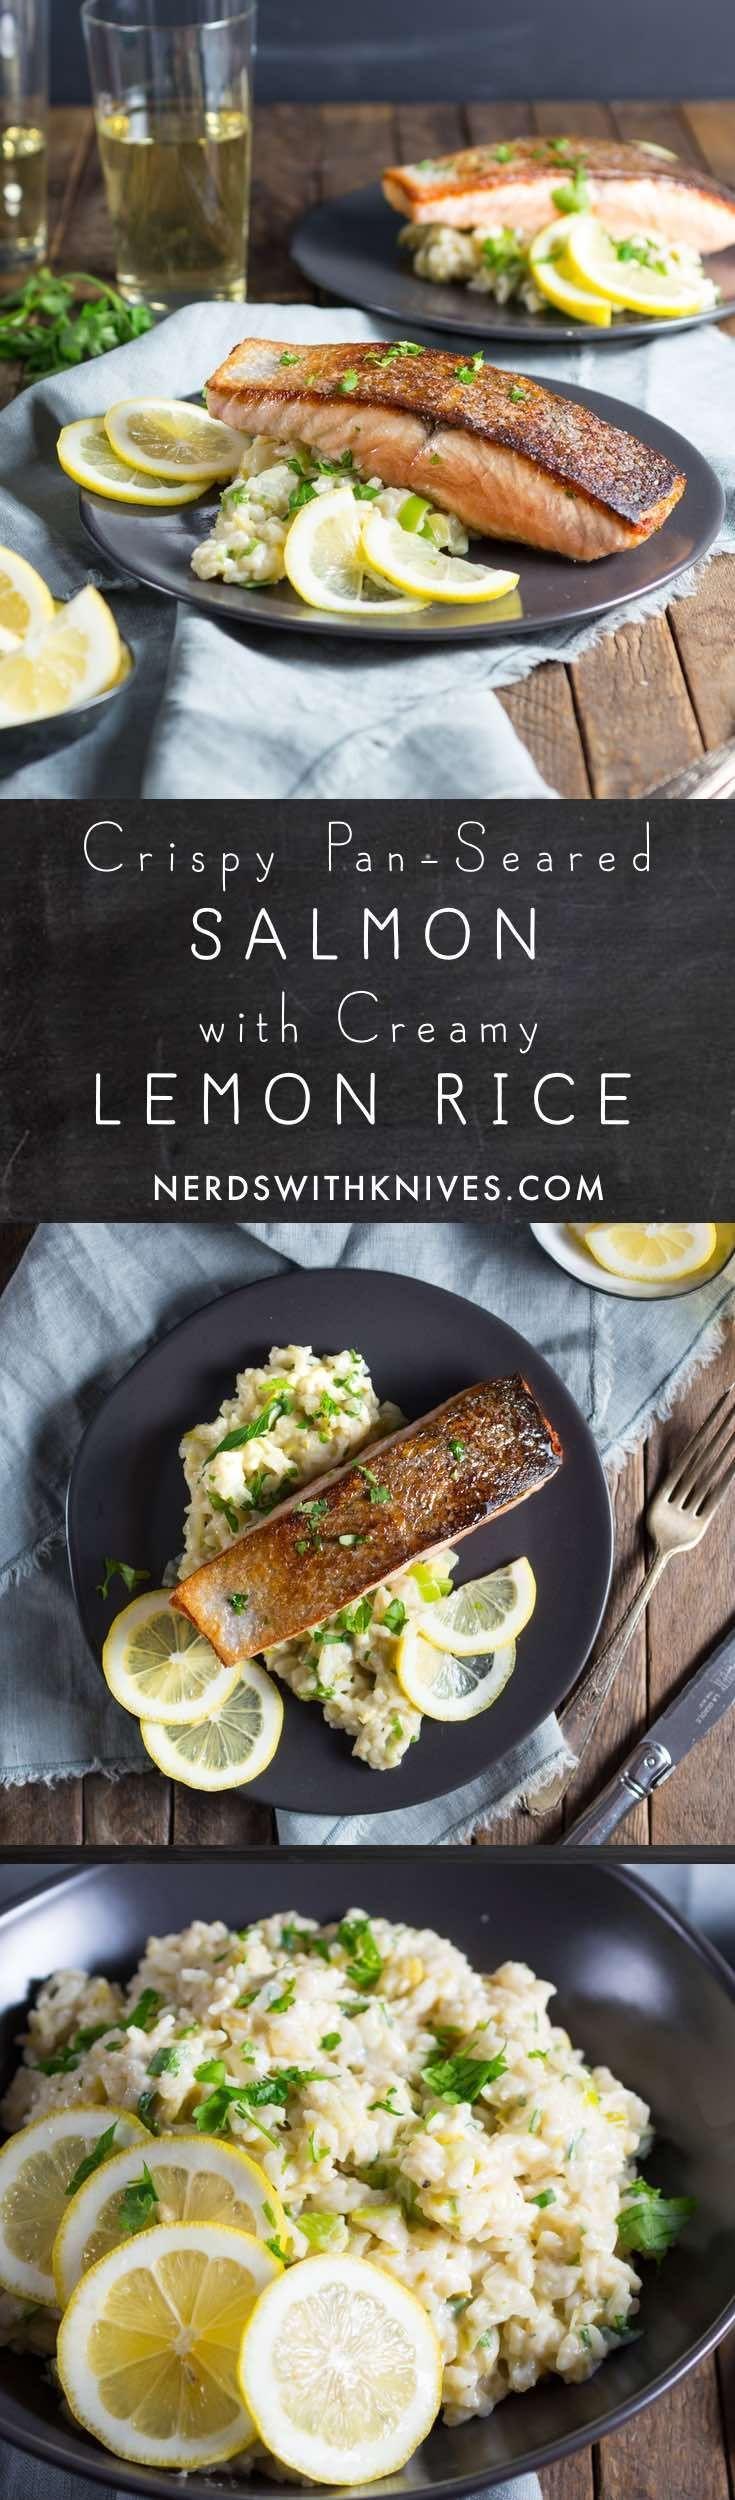 Really, *really* Crispy Pan-Seared Salmon with Creamy Lemon Rice